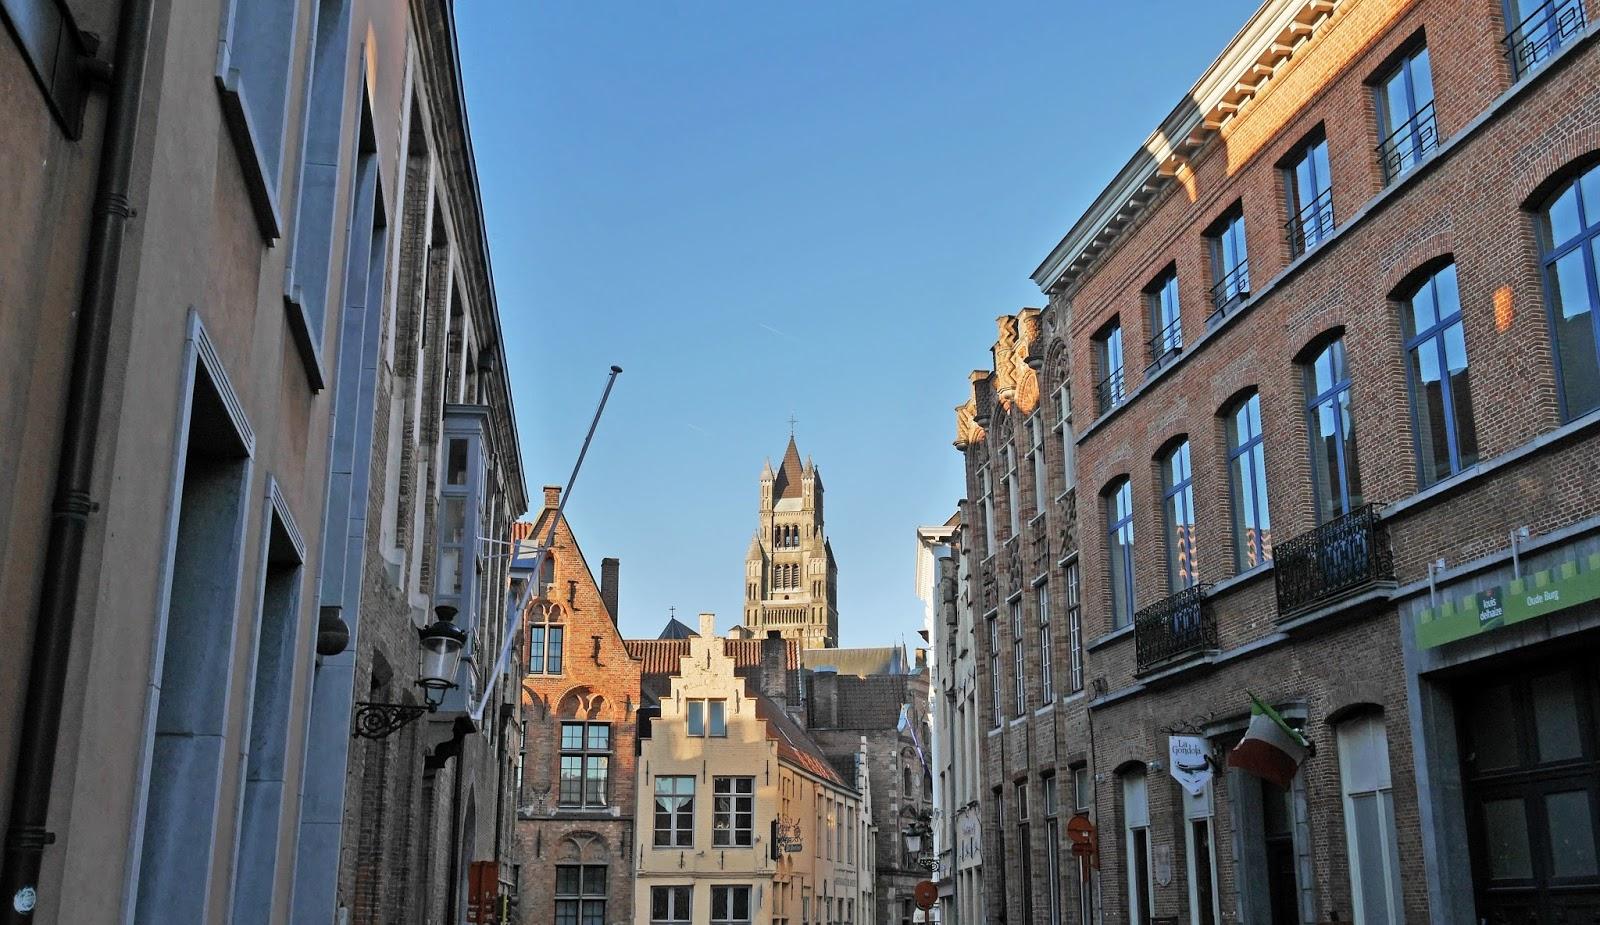 Streets of Bruges, Belgium